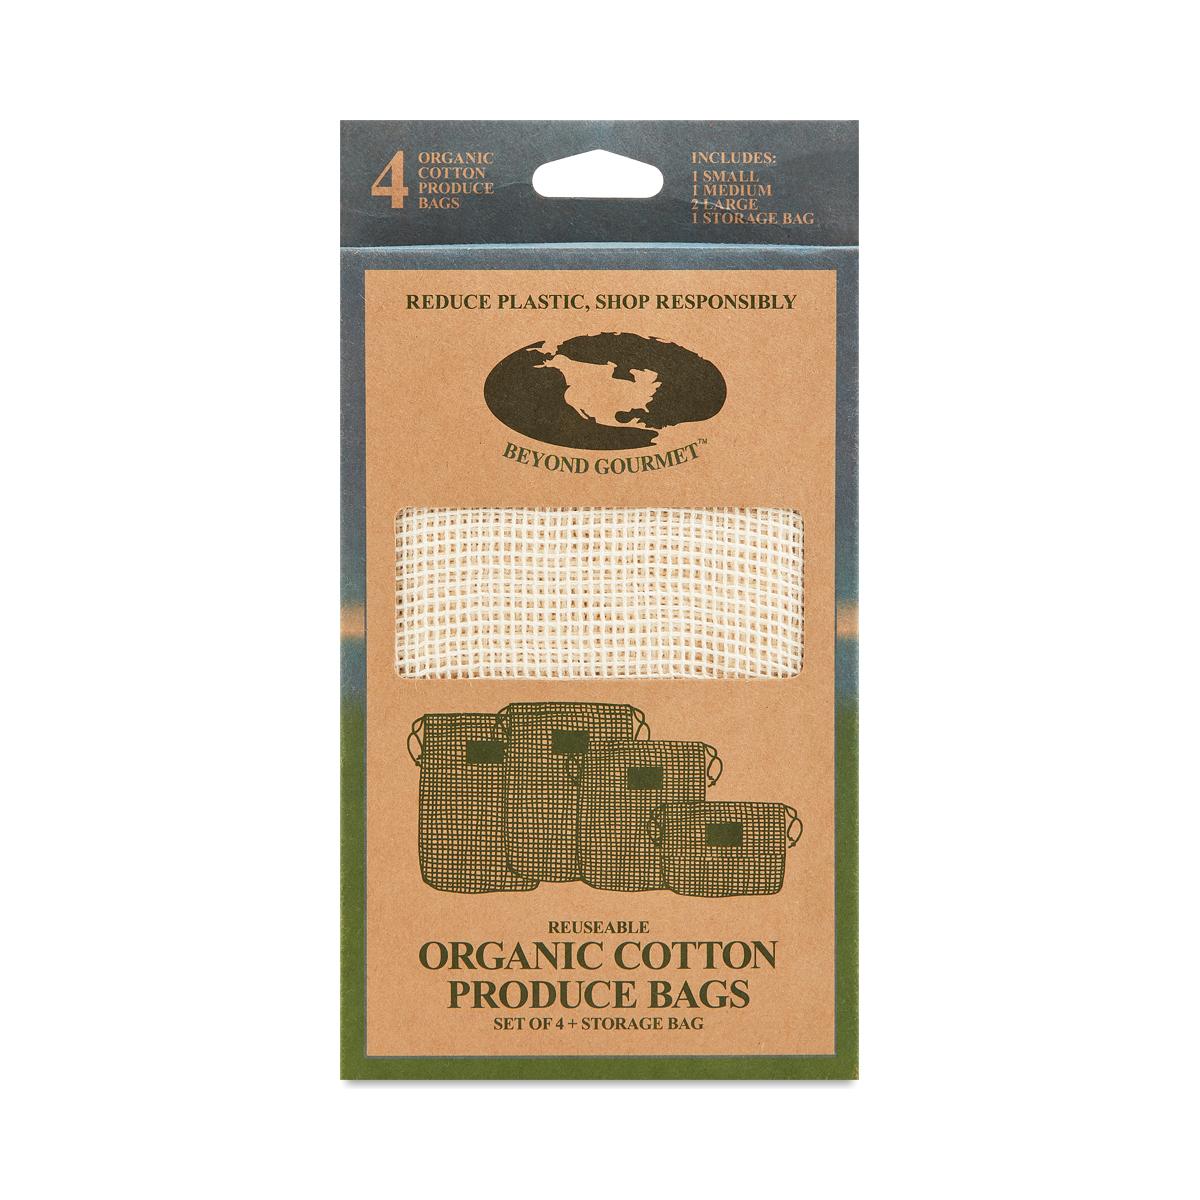 Reusable Organic Cotton Produce Bags 4 bags